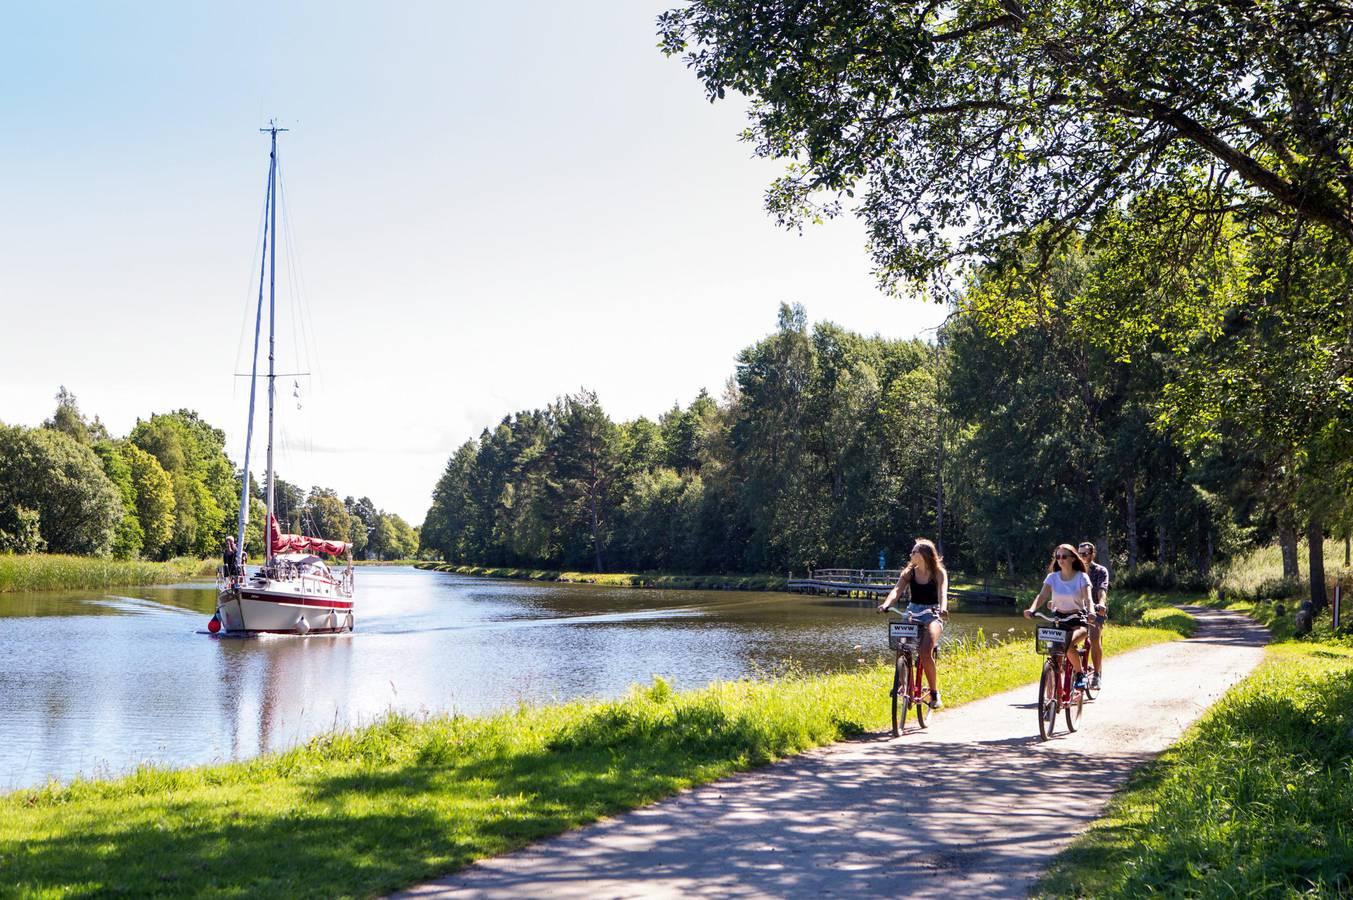 Den Komplette Guiden Til Gota Kanal Visit Sweden